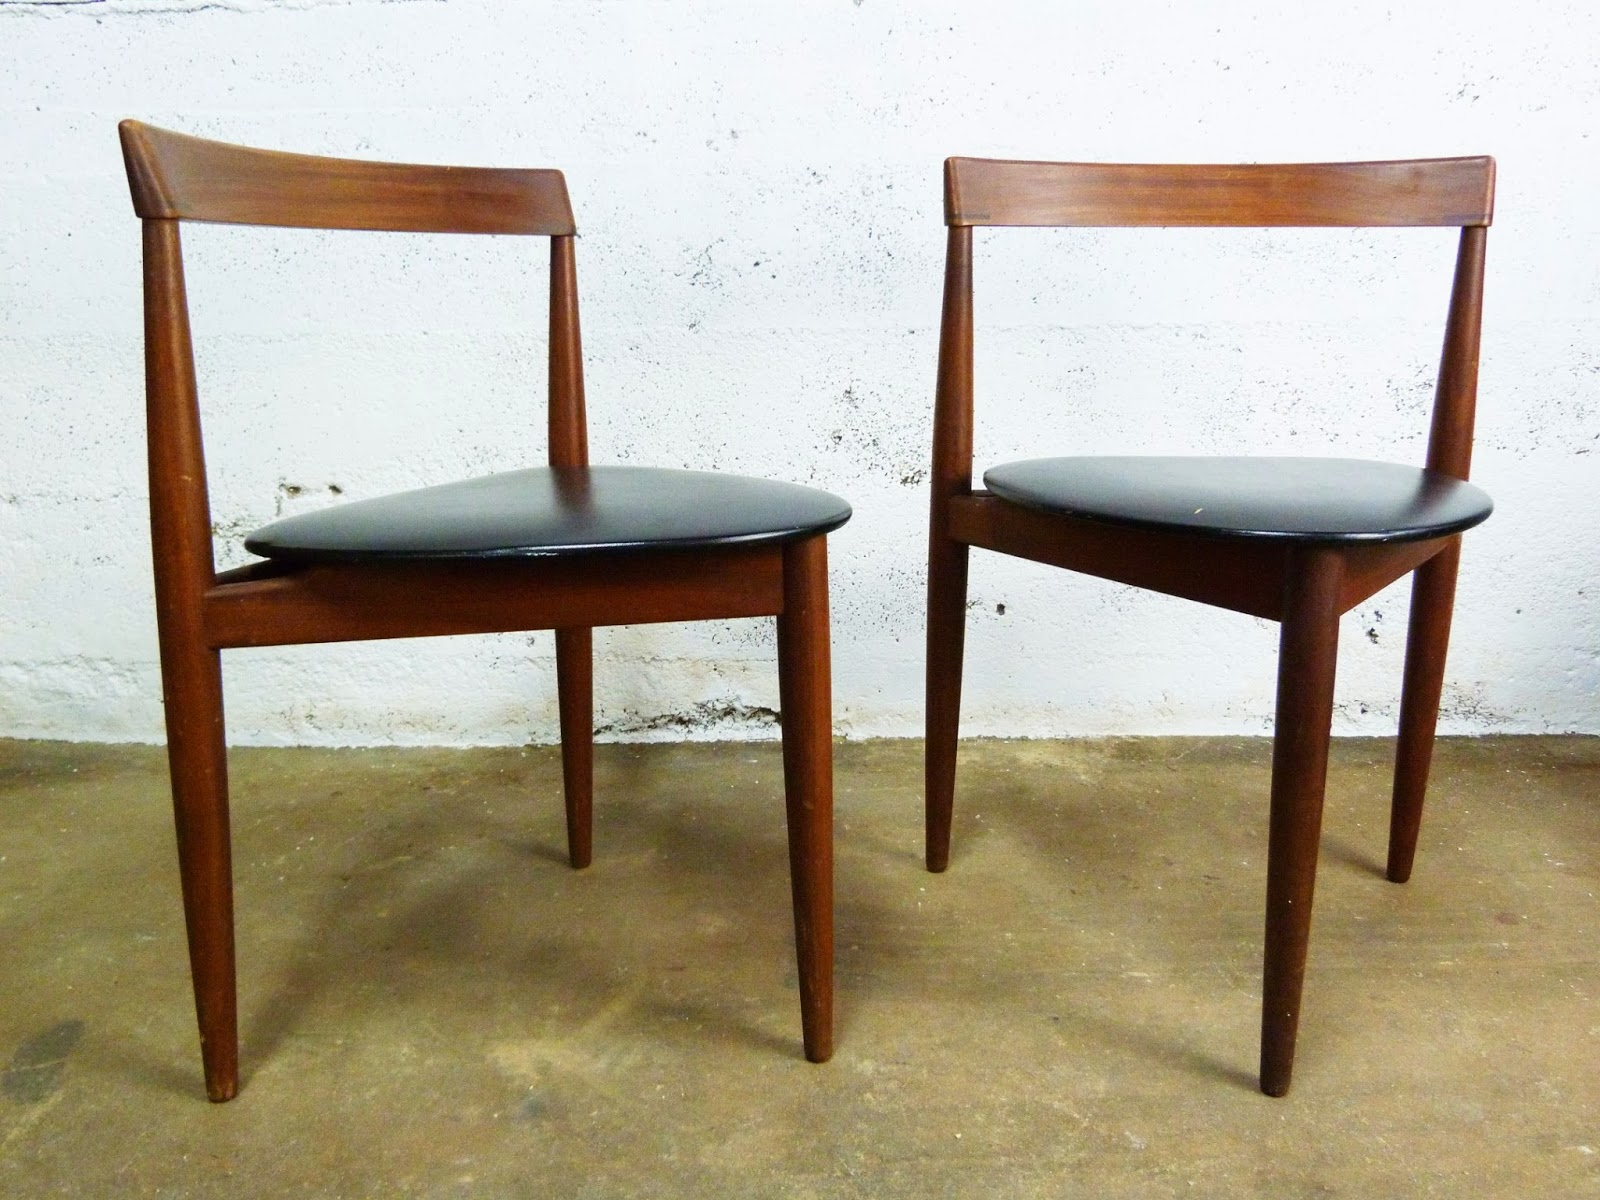 3 legged chair transfer shower modern mid century danish vintage furniture shop used